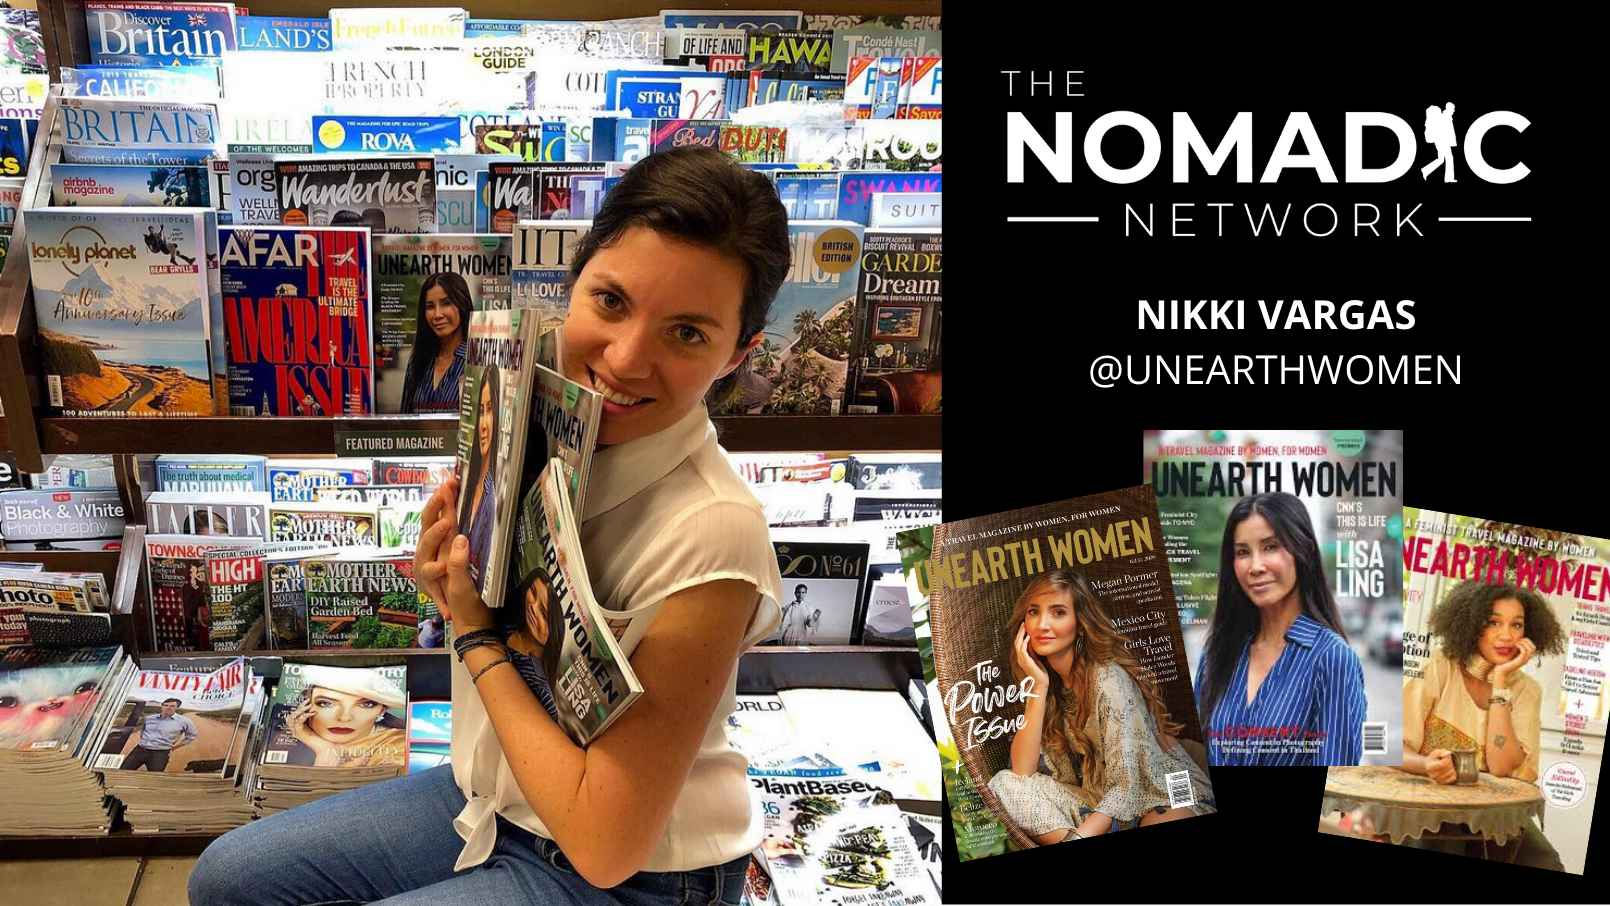 A travel magazine writer posing with her magazine